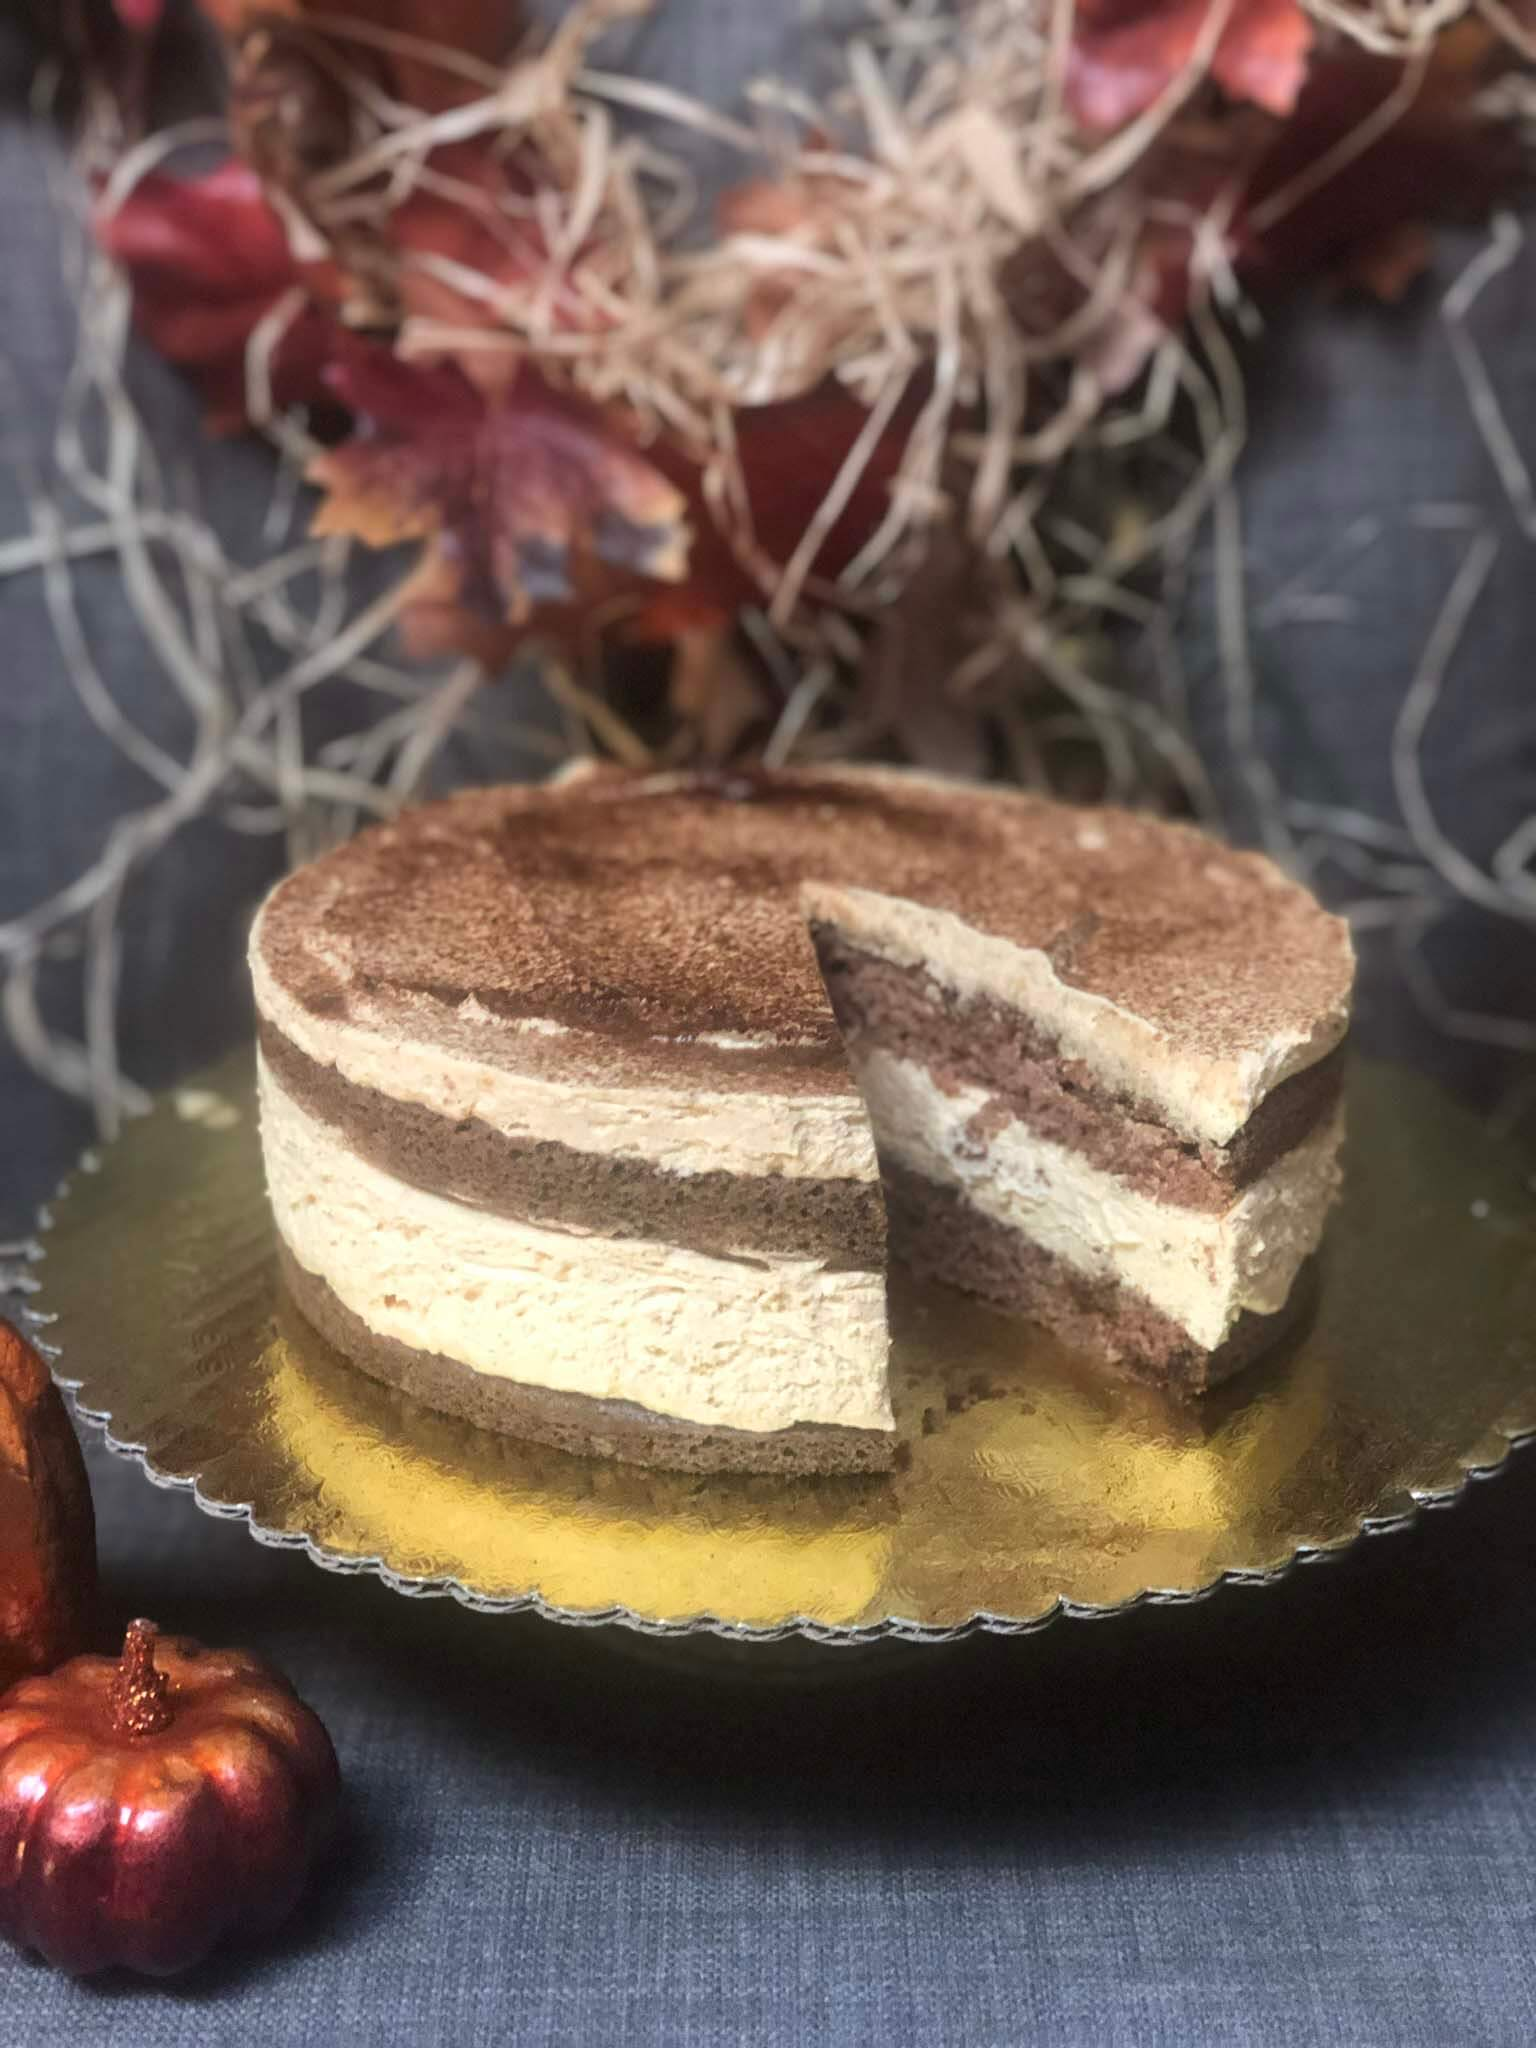 Baked Vegan Sweets